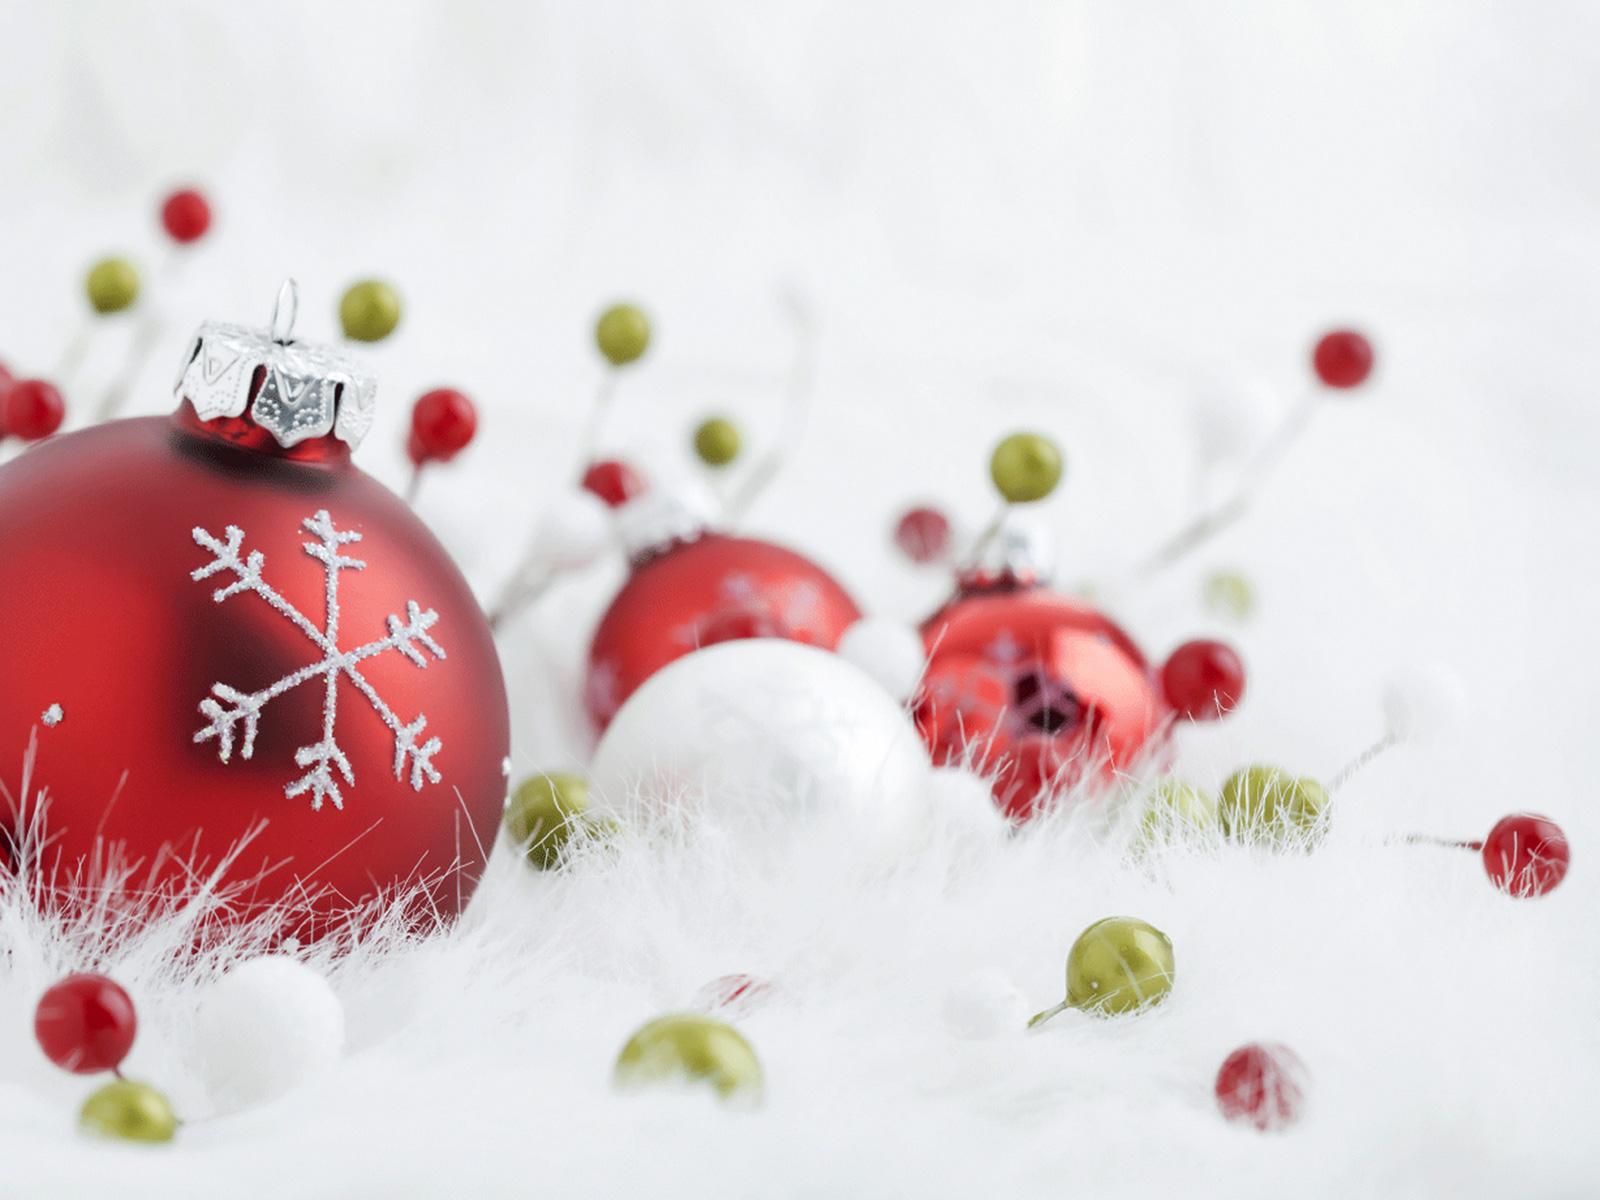 christmas balls background - photo #23